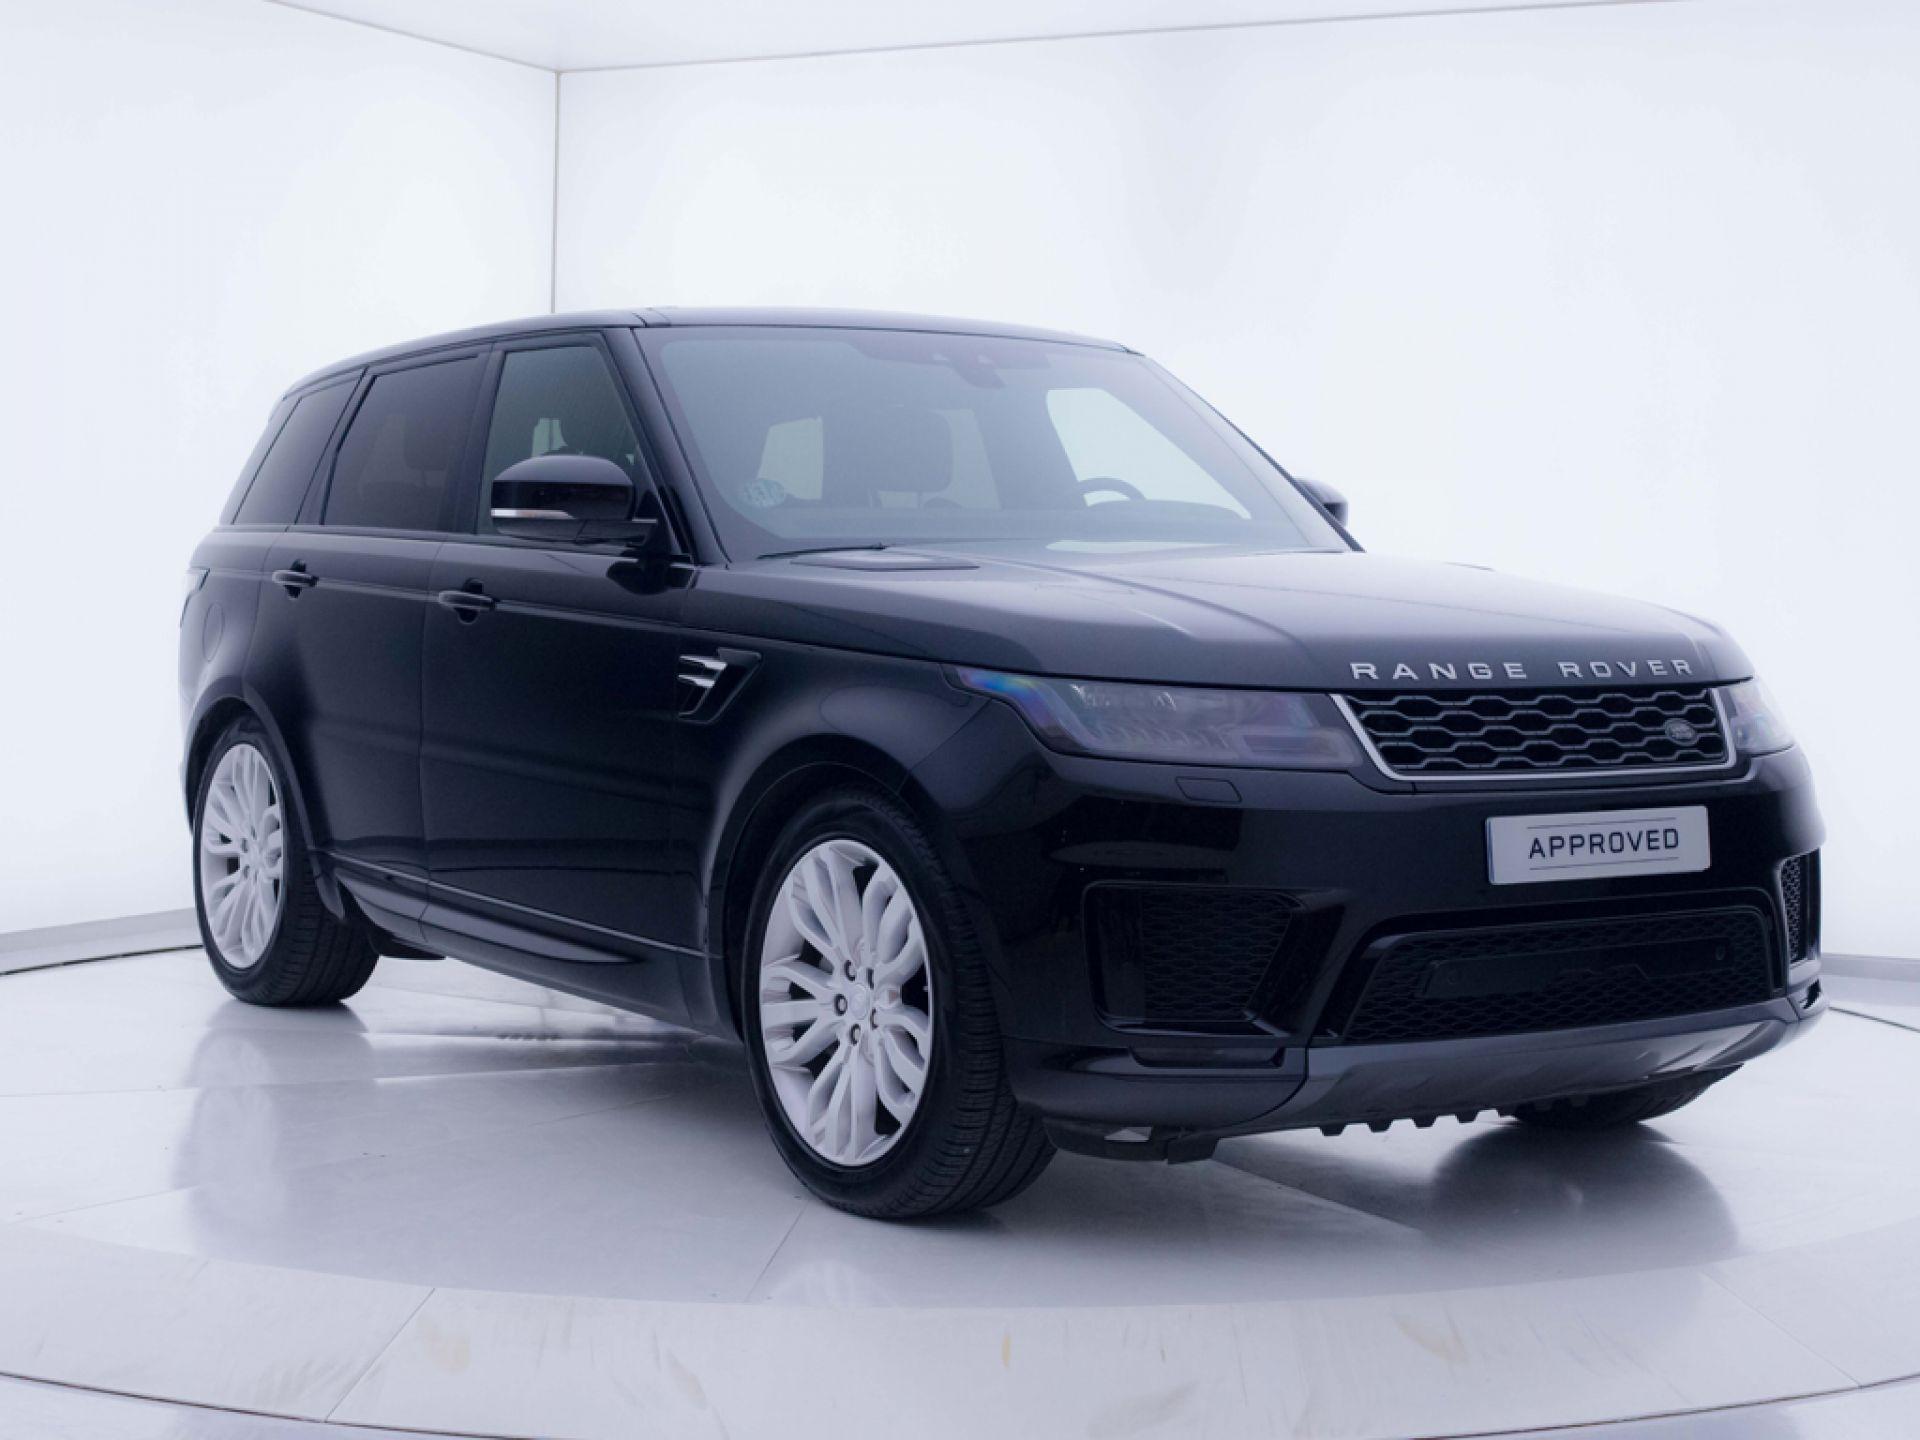 Land Rover Range Rover Sport 3.0 SDV6 225kW (306CV) HSE